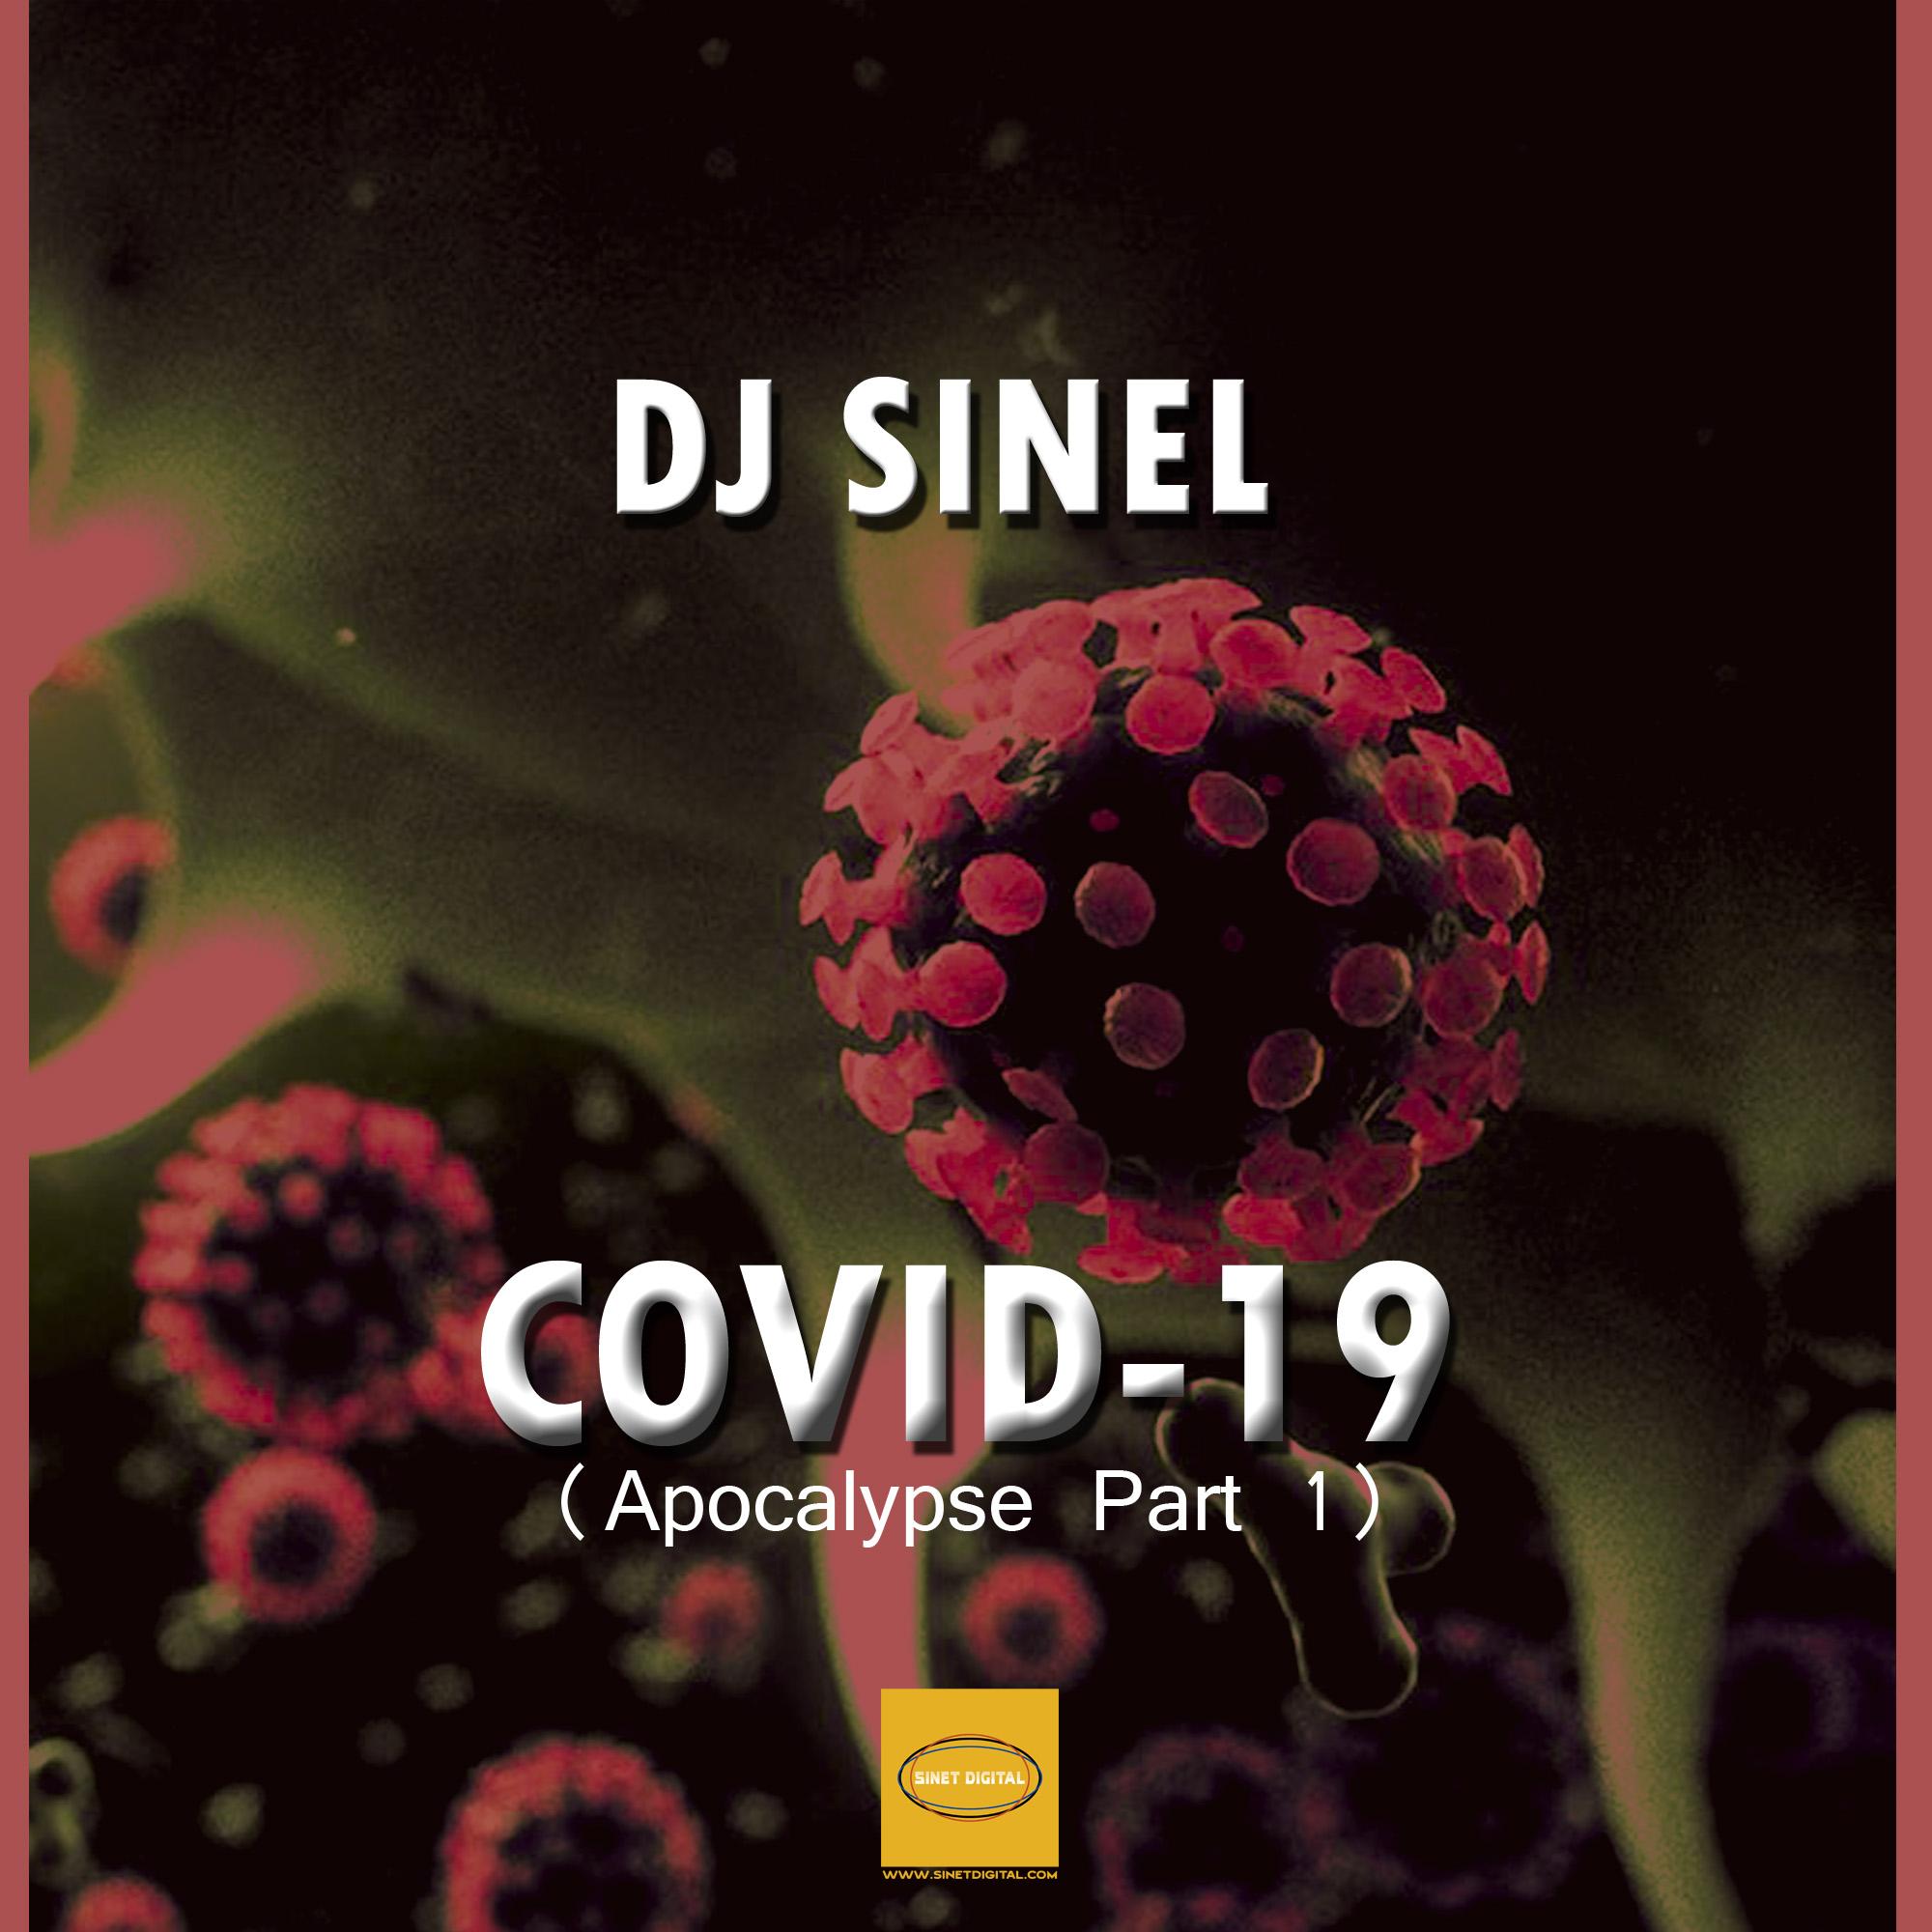 Dj Sinel - Covid-19 ( Apocalypse Part 1 )